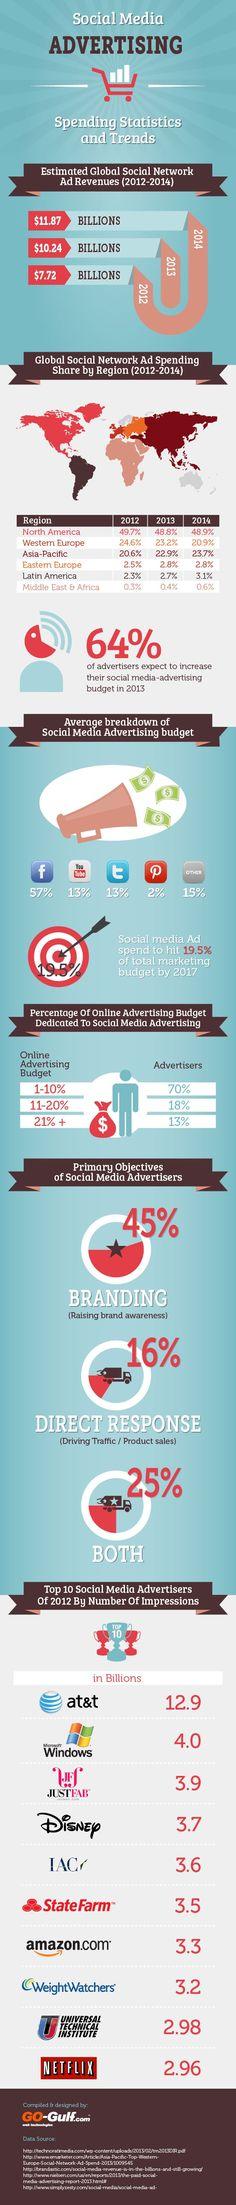 Social Media Advertising - Spending Statistics and Trends [Infographic] Marketing Trends, Inbound Marketing, Marketing Digital, Content Marketing, Internet Marketing, Online Marketing, Social Media Marketing, Online Advertising, Marketing And Advertising